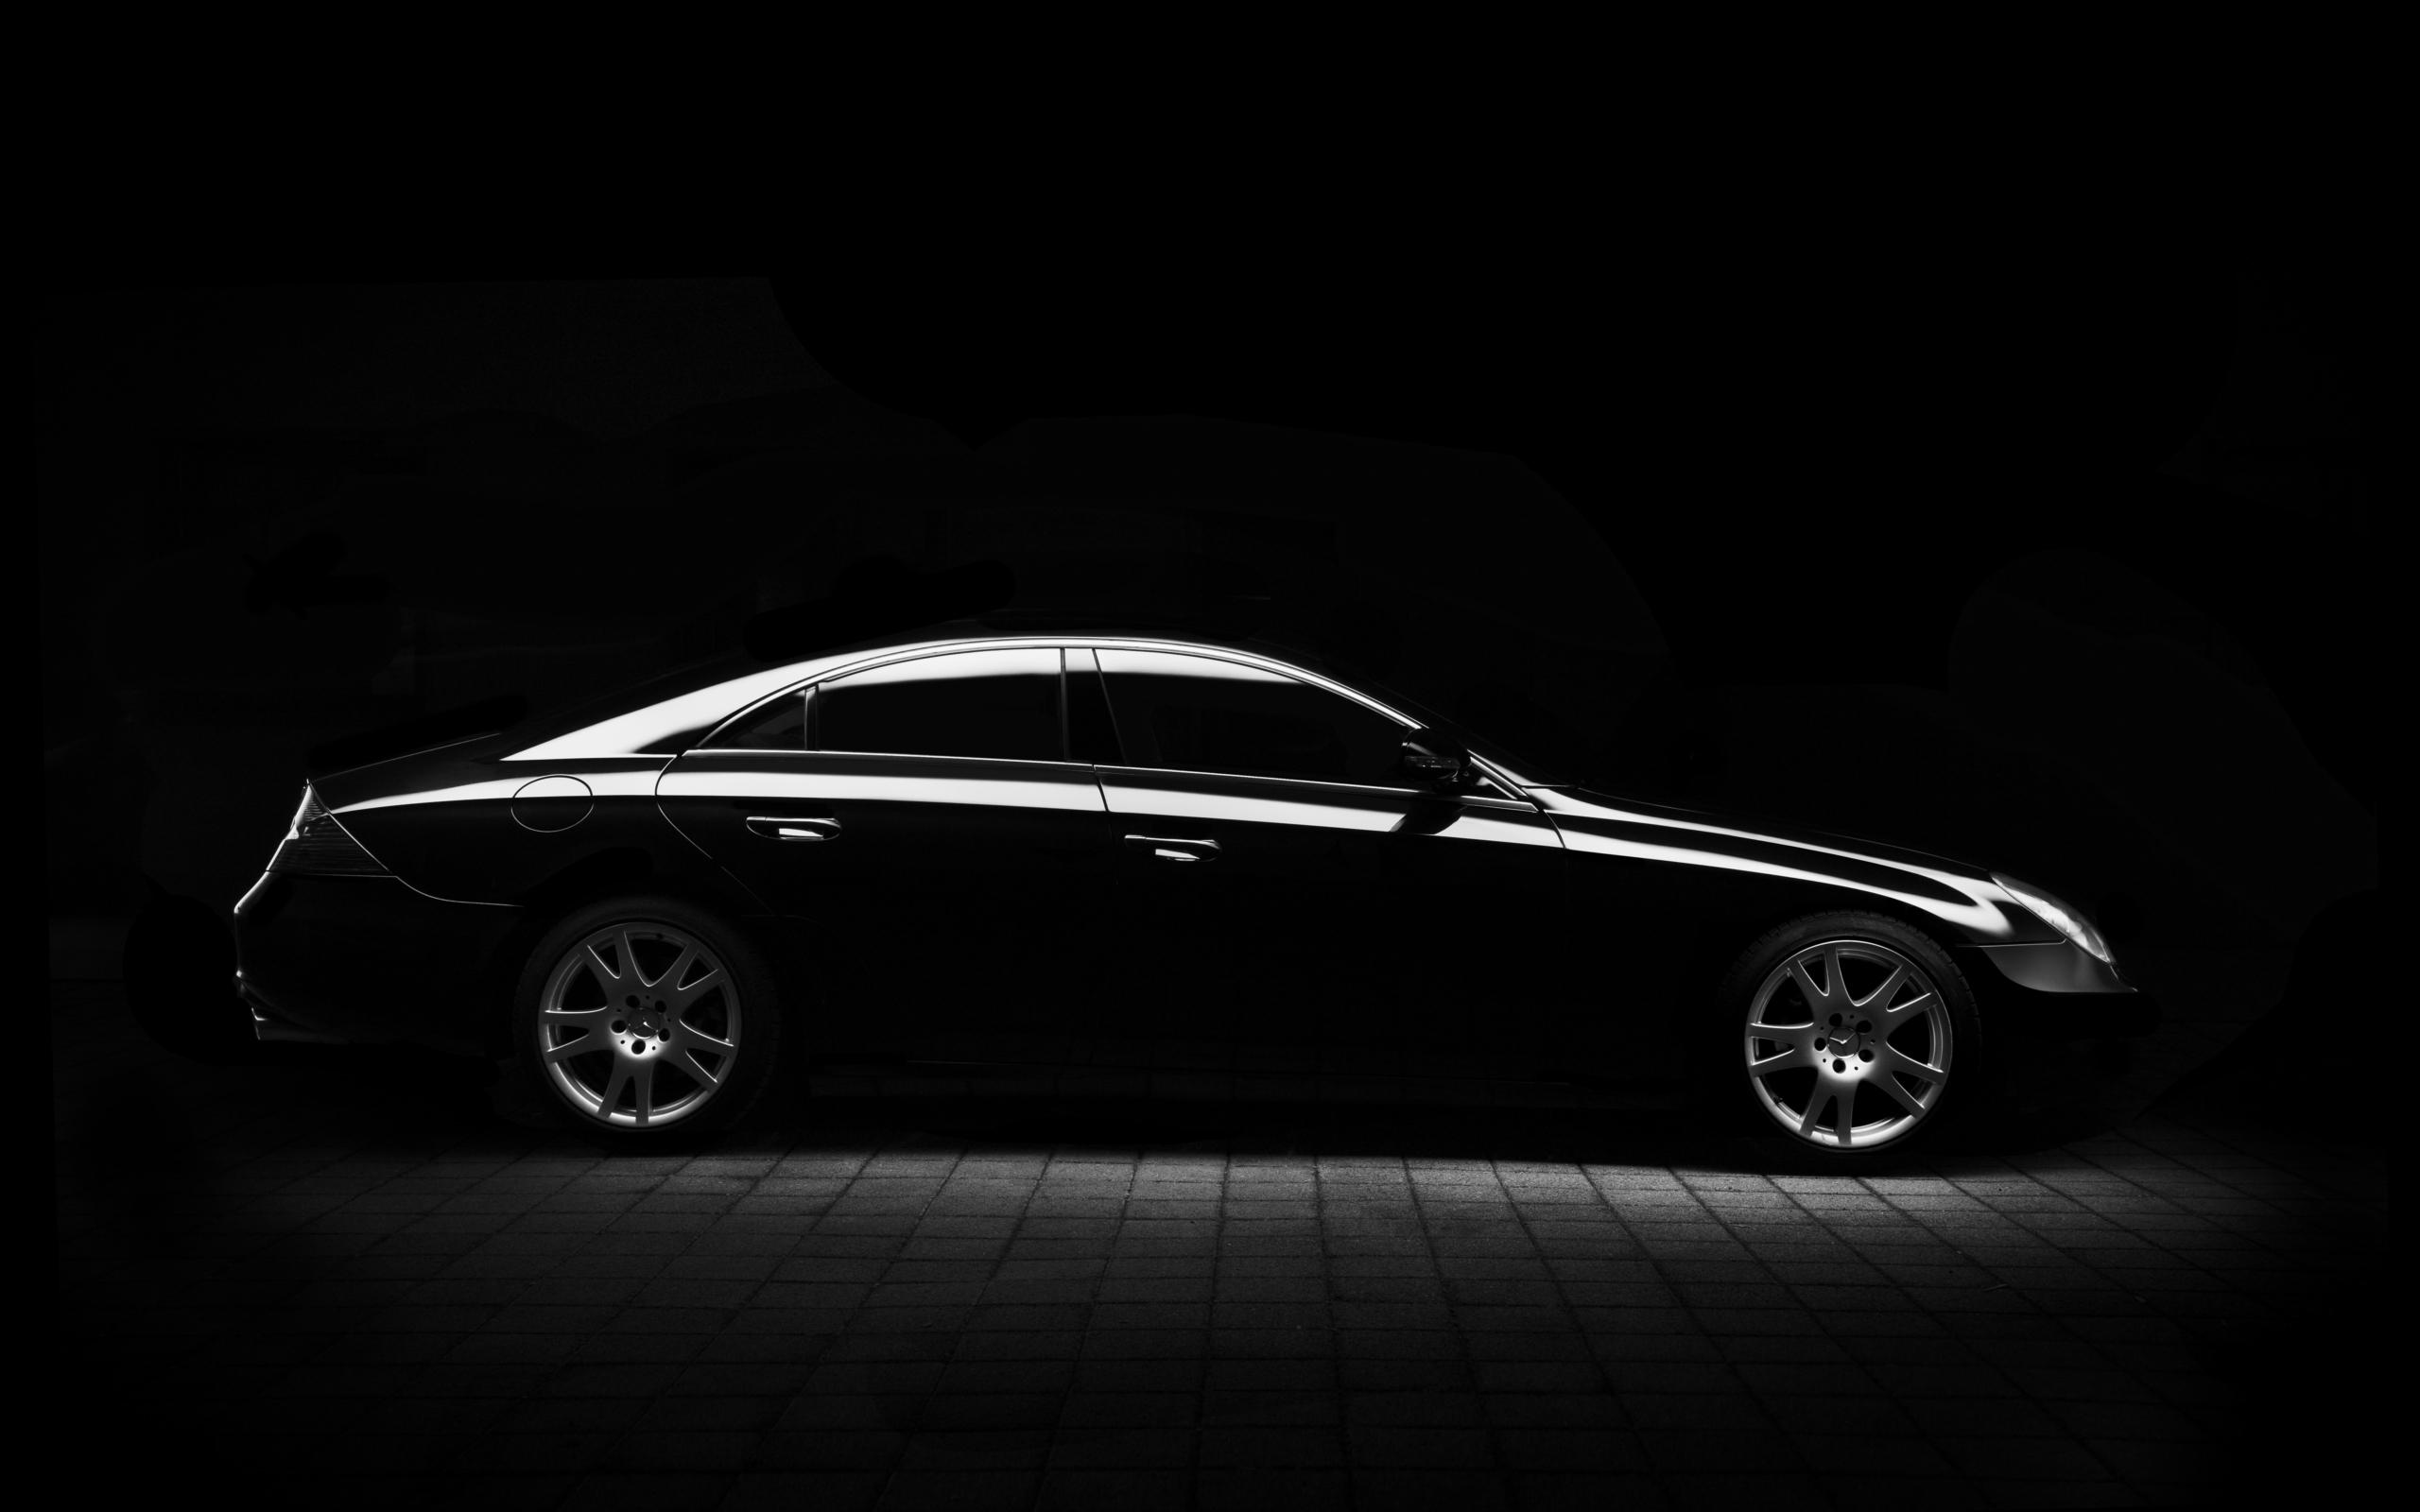 Nanoversiegelung Auto